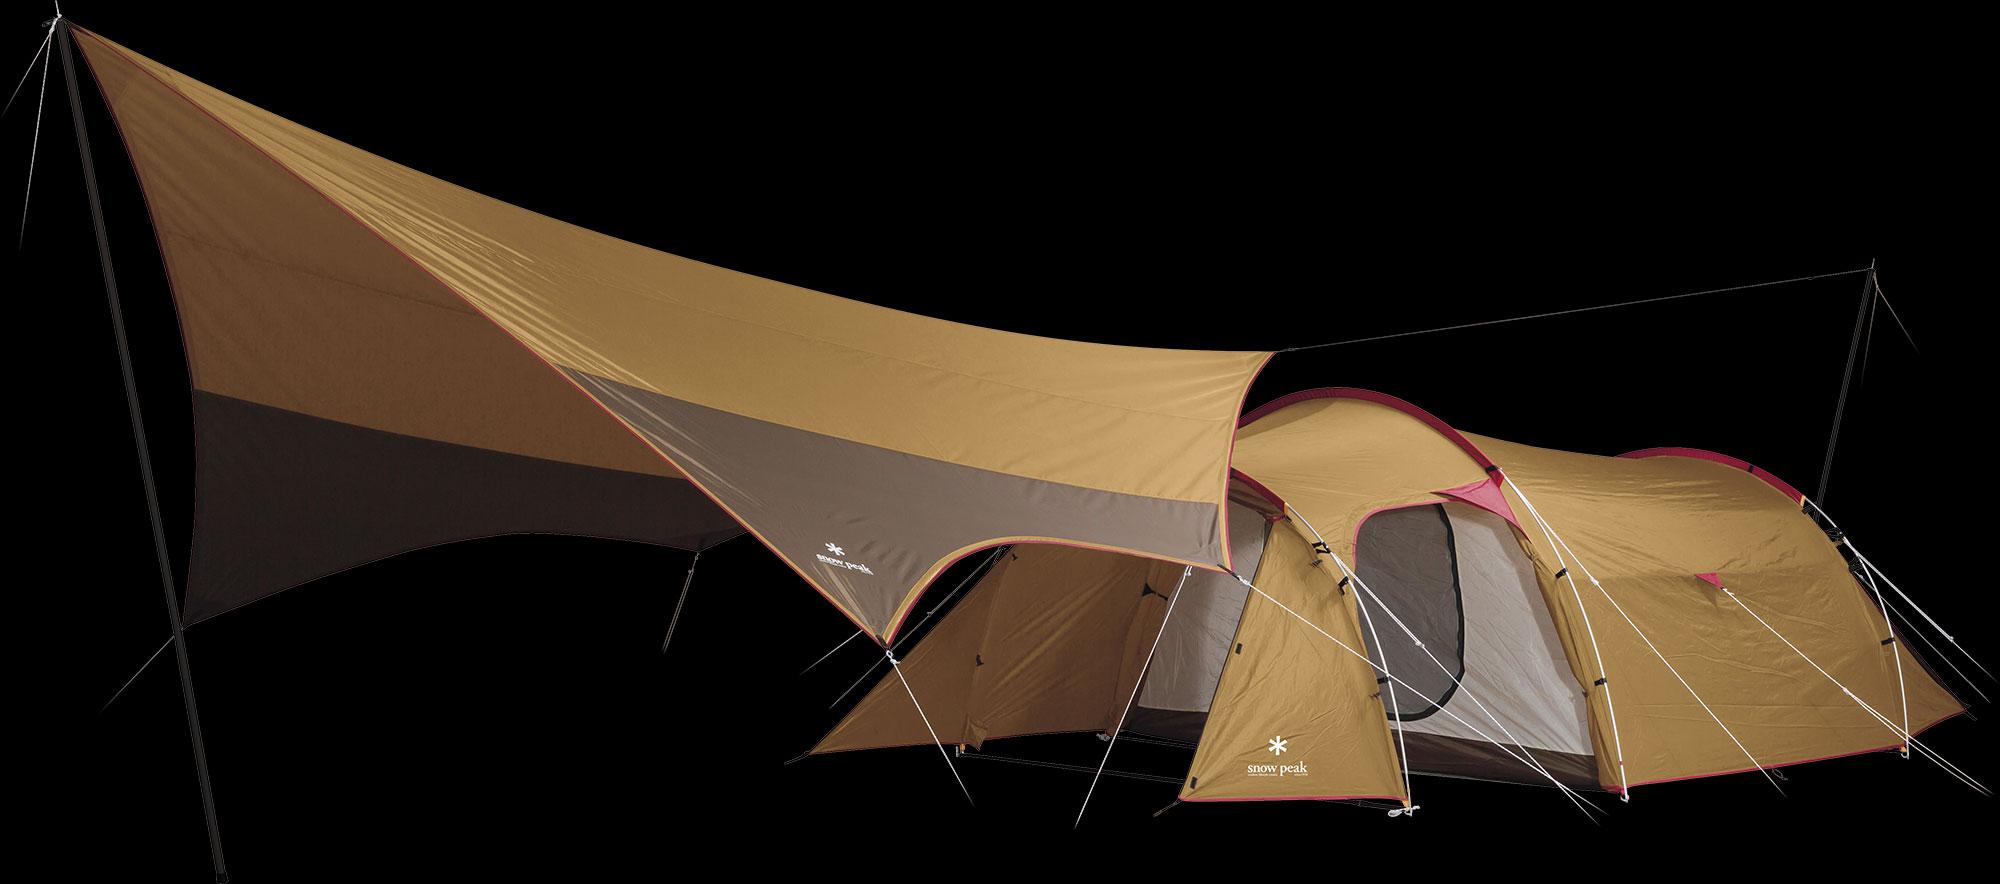 Snow Peak 60Th Anniversary Trekking Set Set-160 Camping-Kochgeschirr